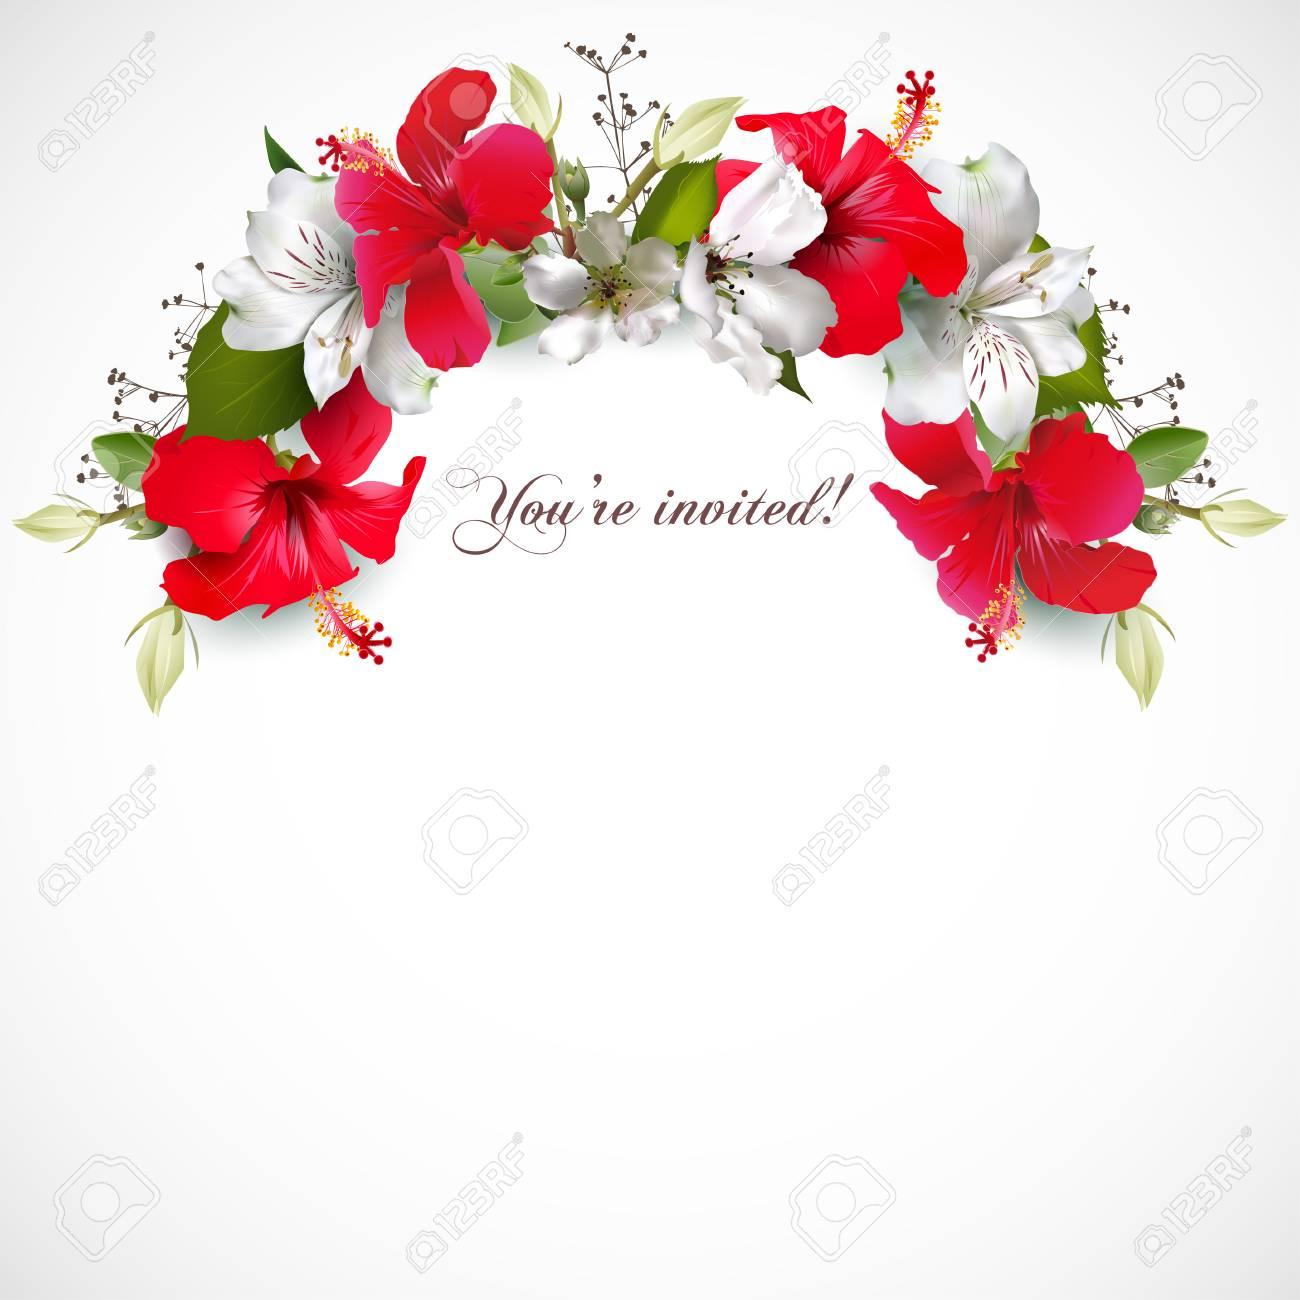 Invitation with hibiscus - 119068620